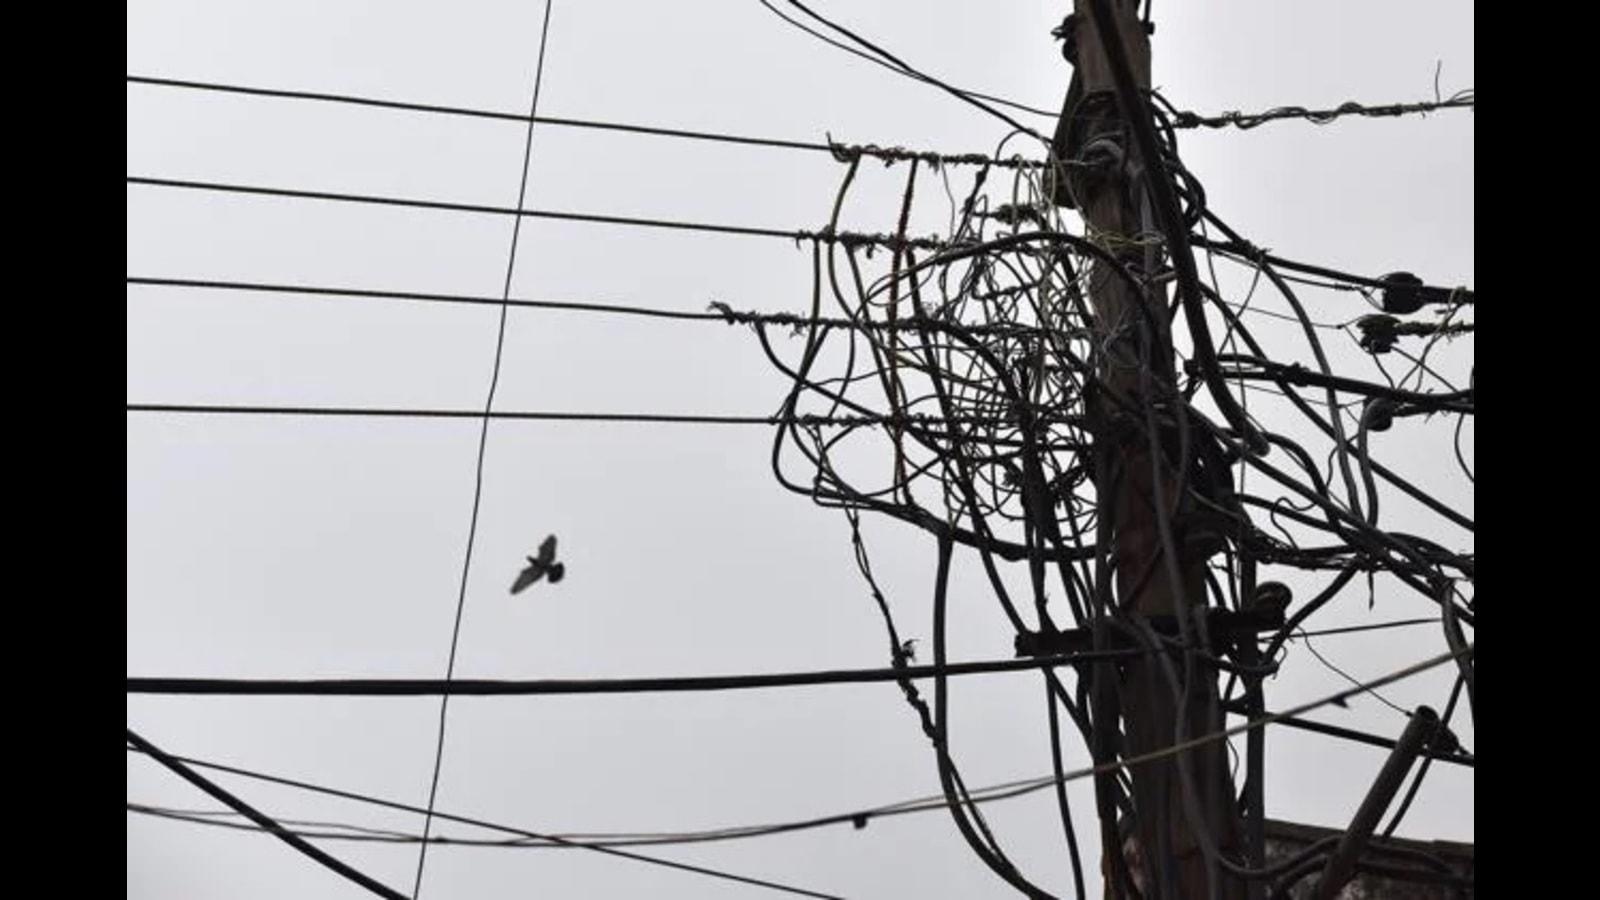 UP power engineers suspend stir till Oct 19